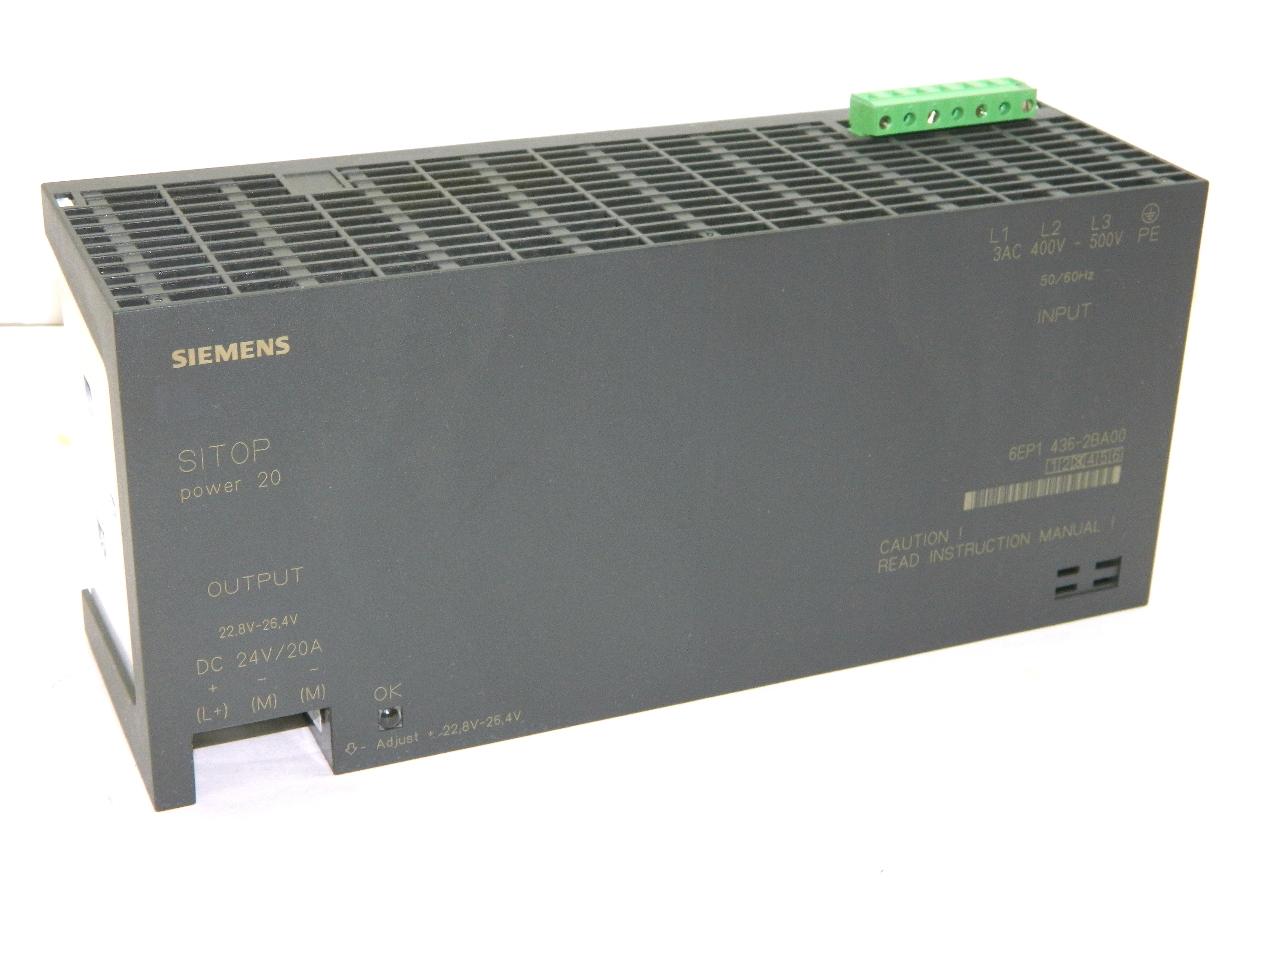 Siemens Power